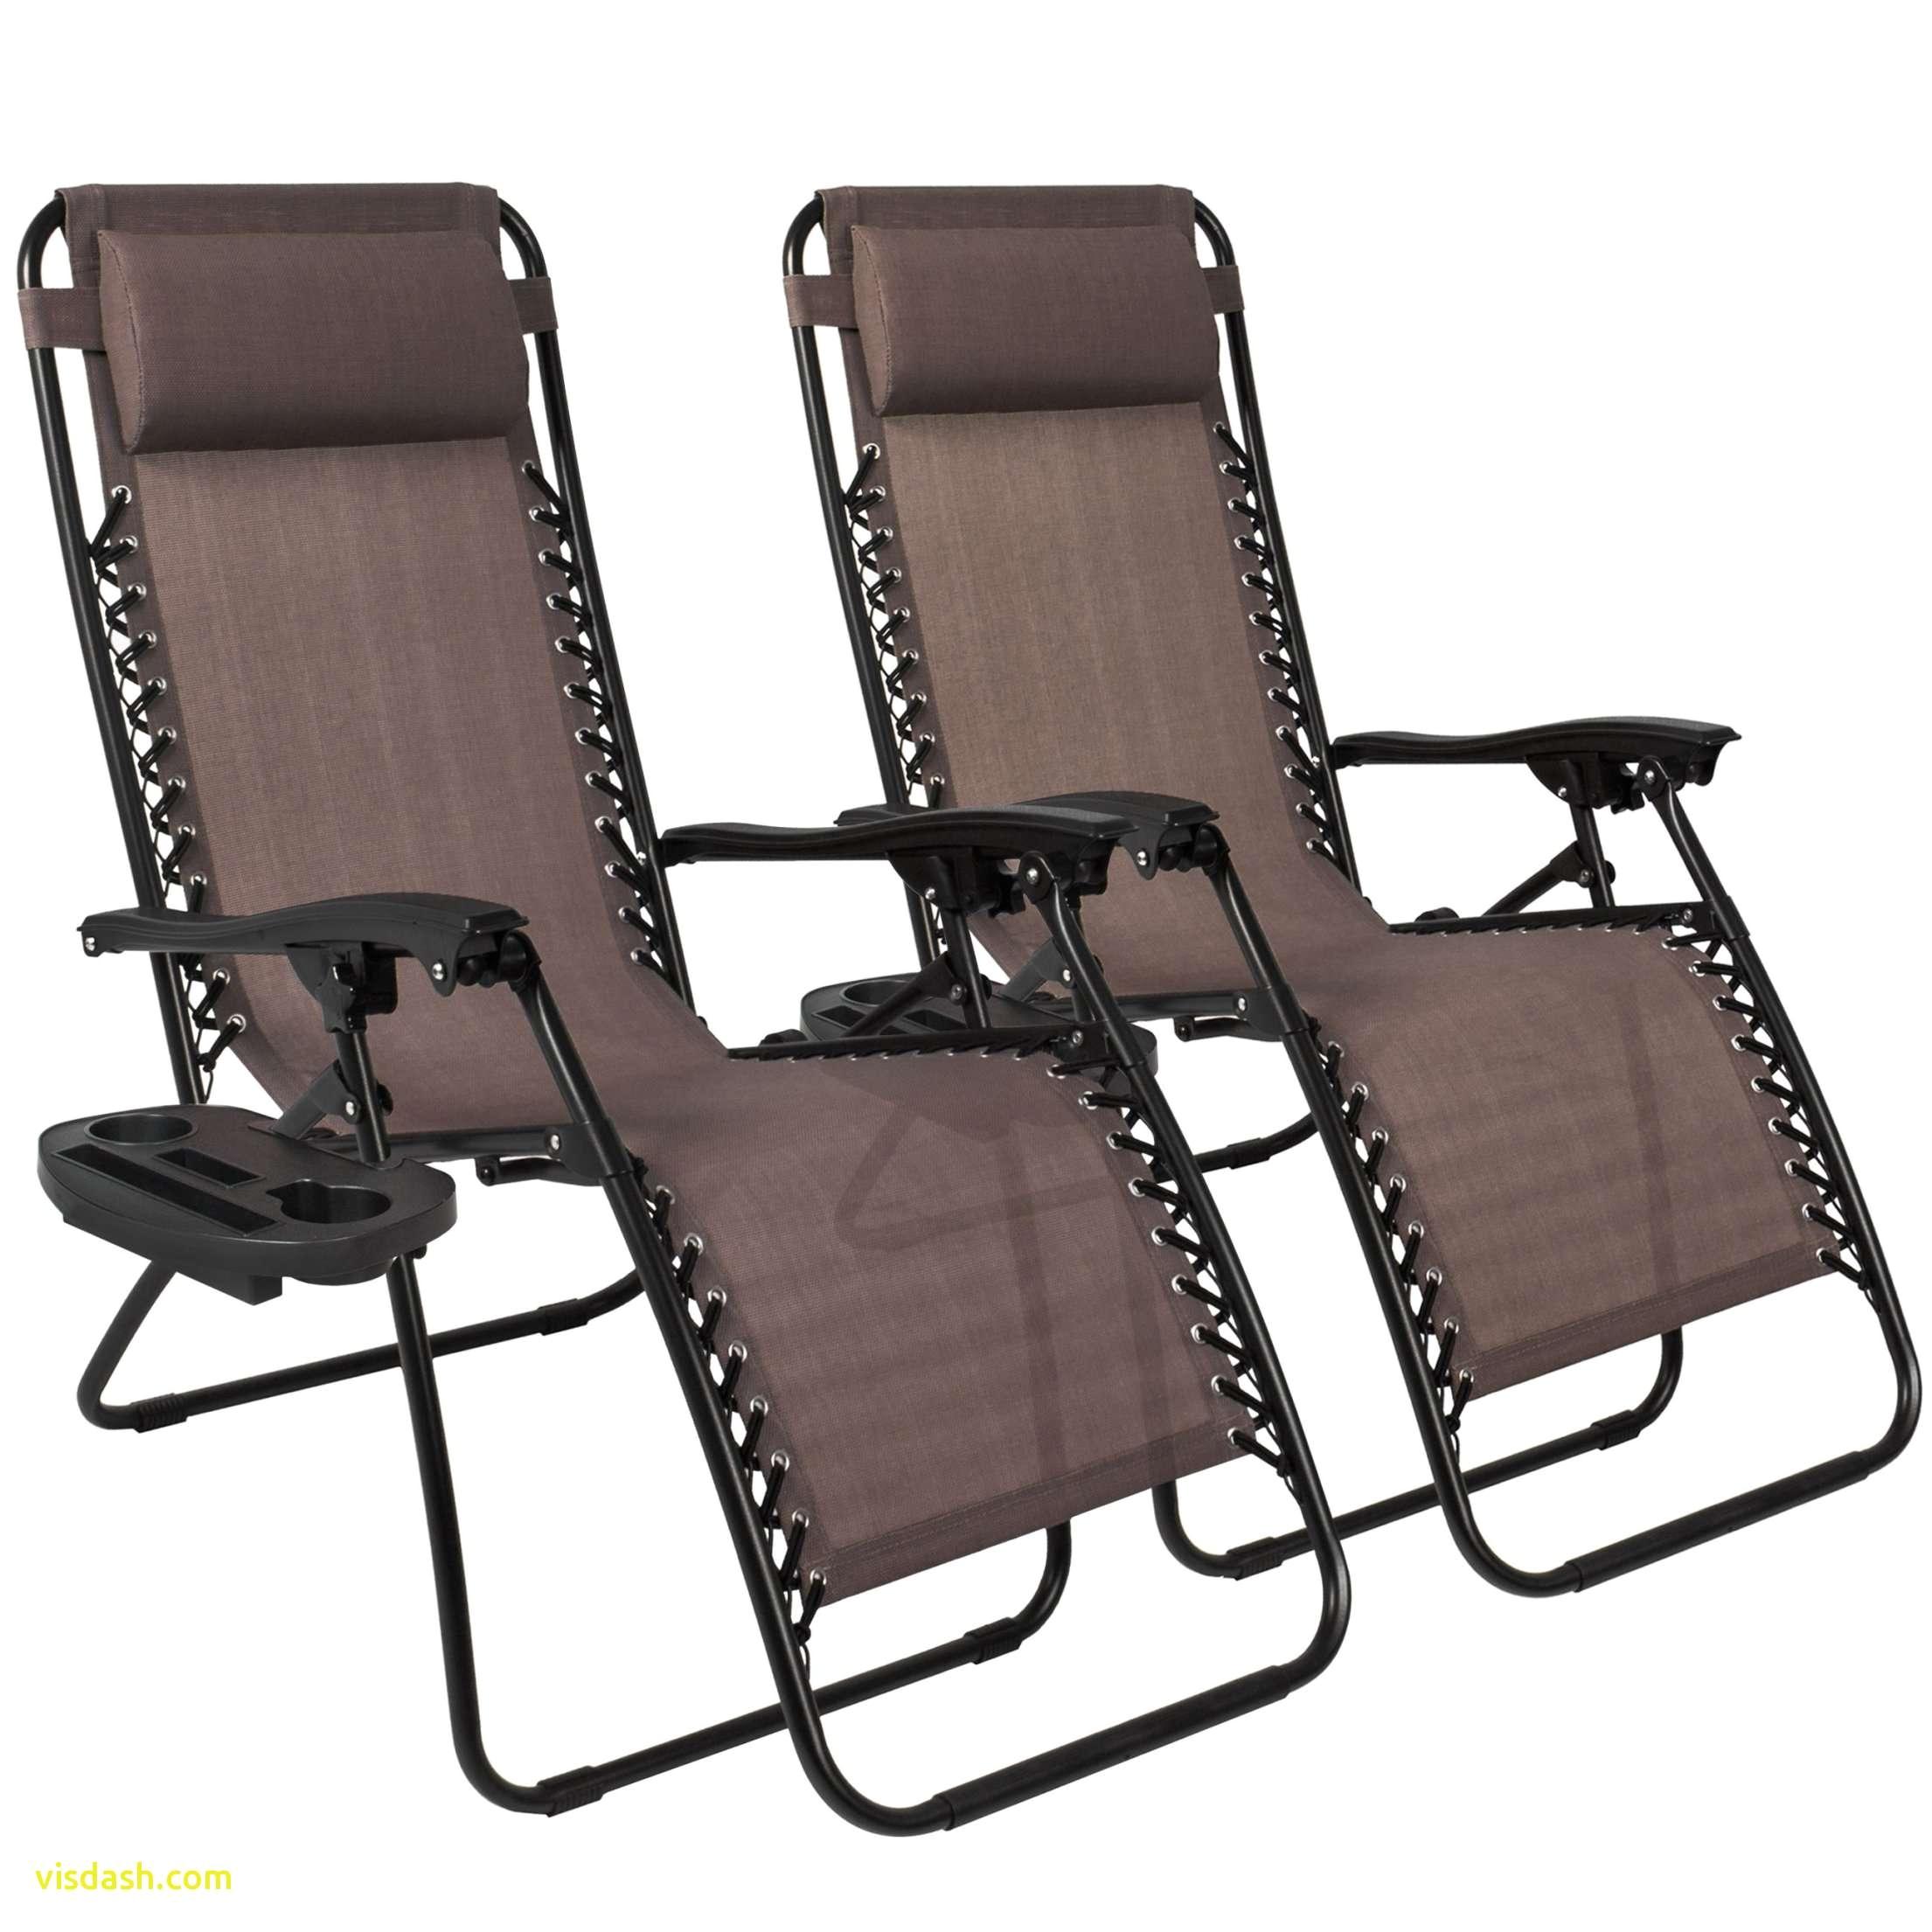 Wedo 0 Gravity Chair Elegant Patio Zero Gravity Chair Home Decor